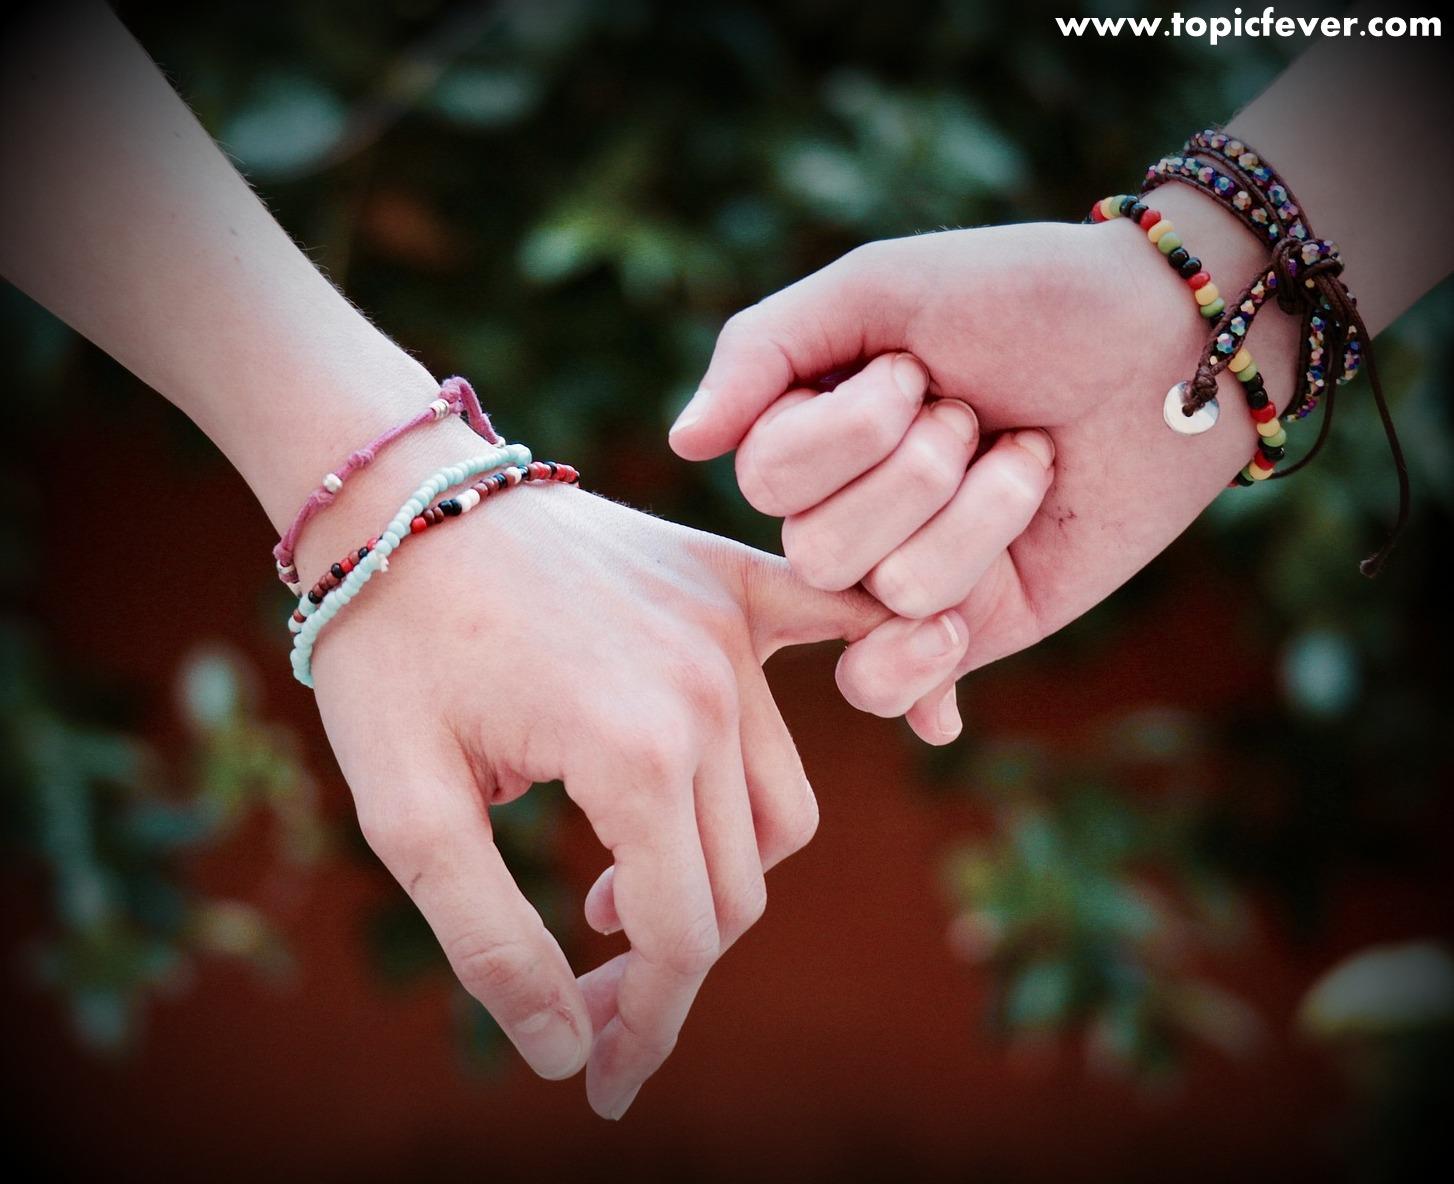 Friendship Quotes In Hindi Best Friend Shayari Dosti